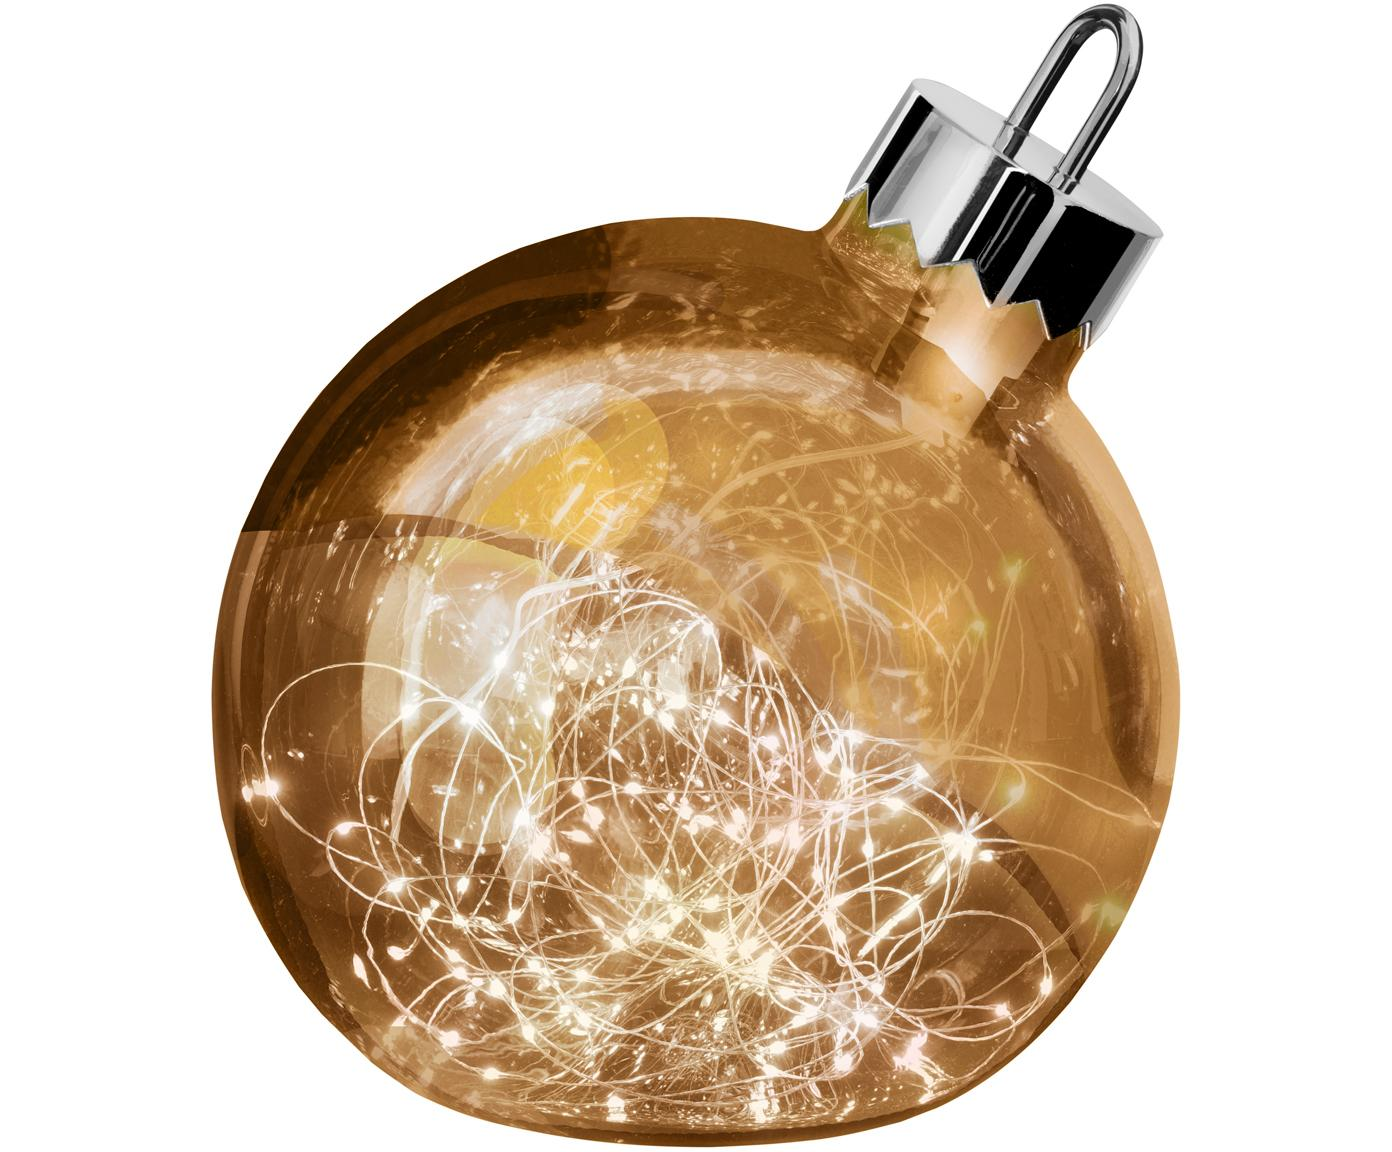 LED lichtobject Aggia, Messingkleurig, Ø 20 x H 22 cm